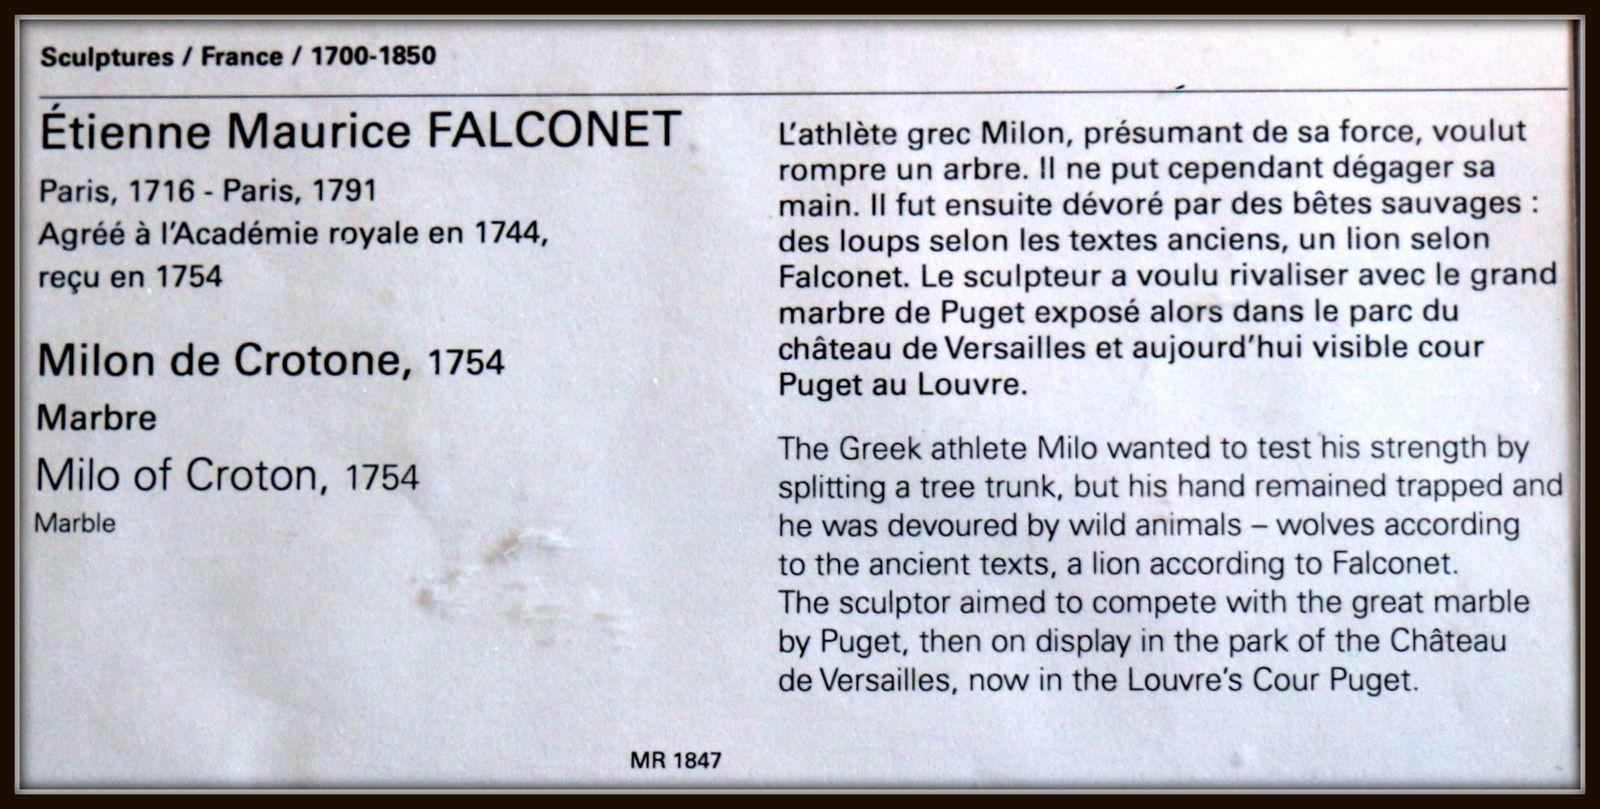 Etienne Maurice Falconet, Milon de Crotone